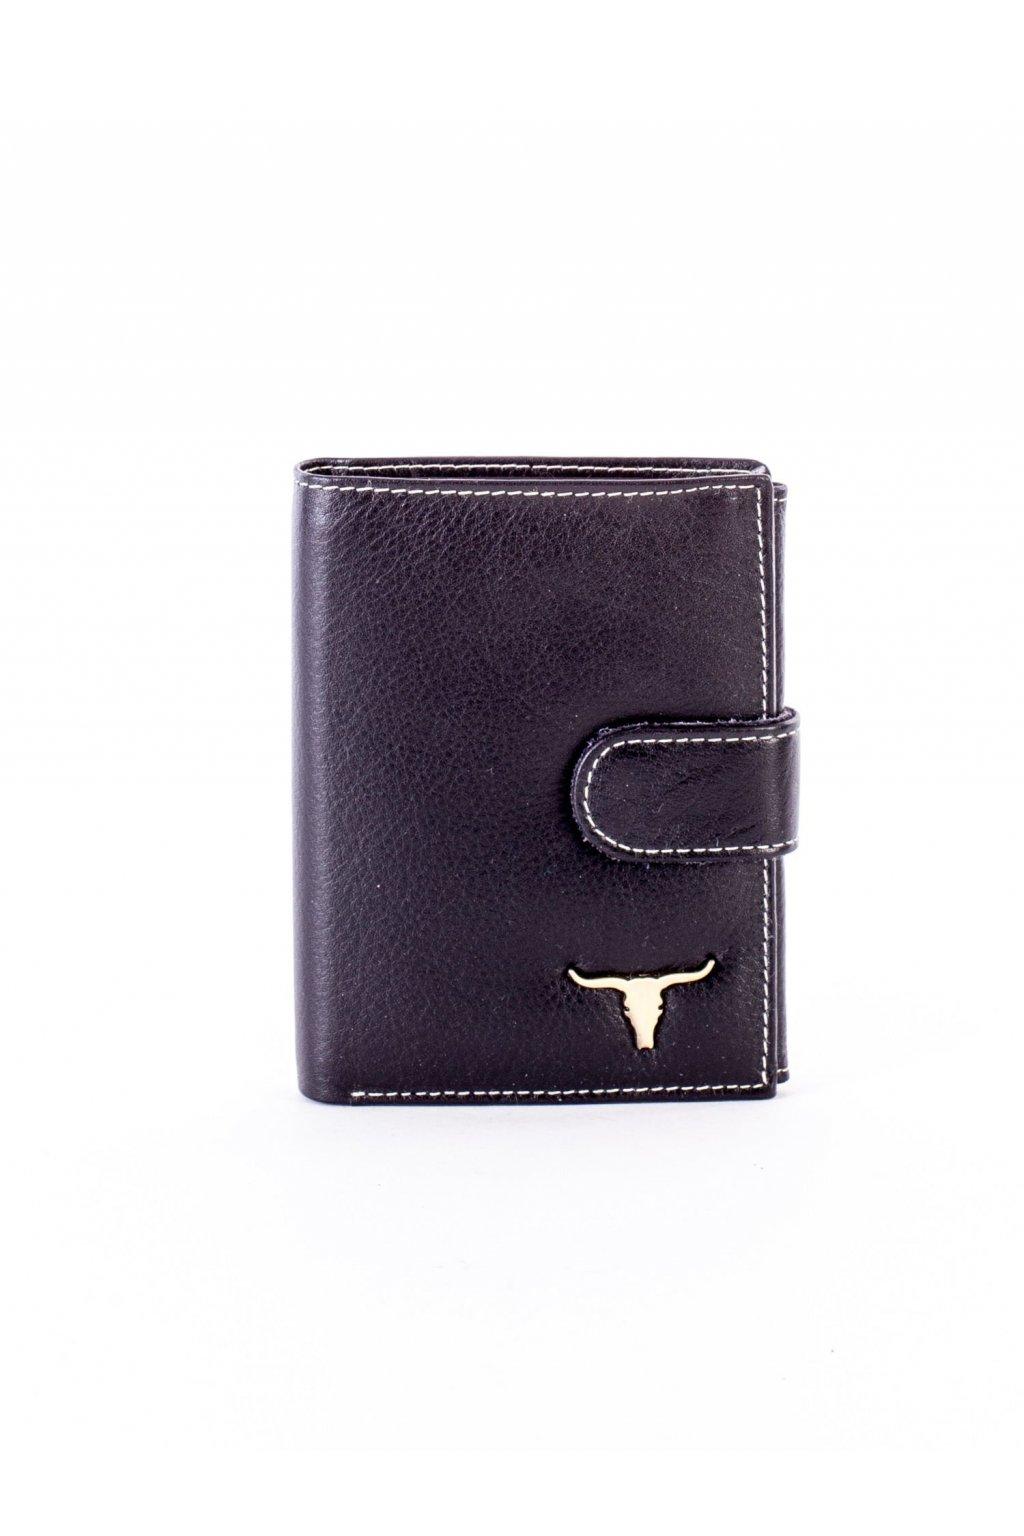 Pánska peňaženka kód CE-PR-RM-03L-BAW3.31